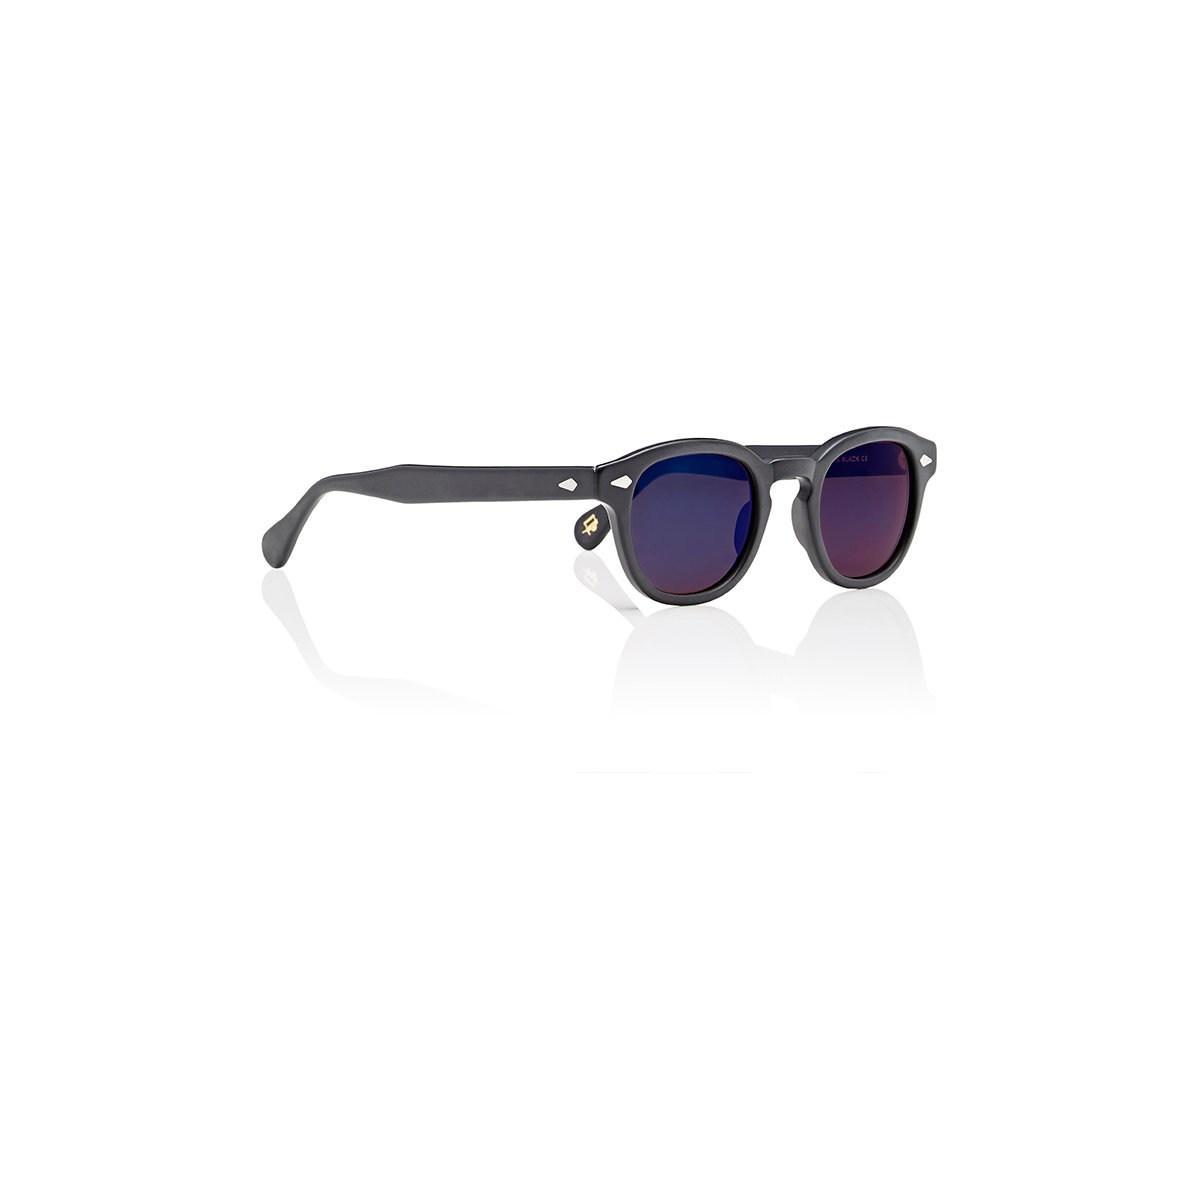 5baa9b56496 Moscot - Purple Lemtosh Sunglasses for Men - Lyst. View fullscreen